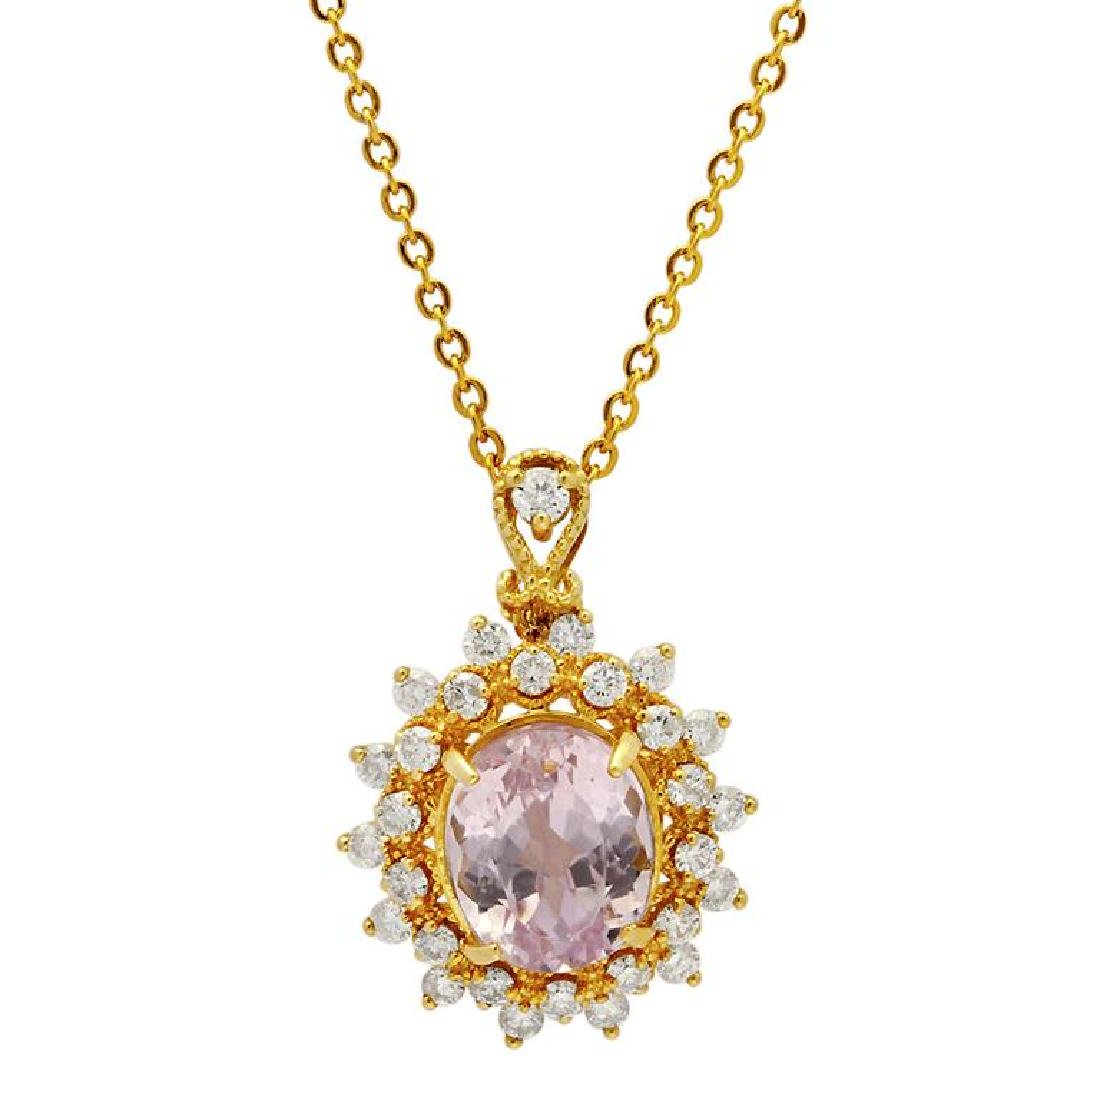 14k Yellow Gold 5.30ct Kunzite 1.09ct Diamond Pendant